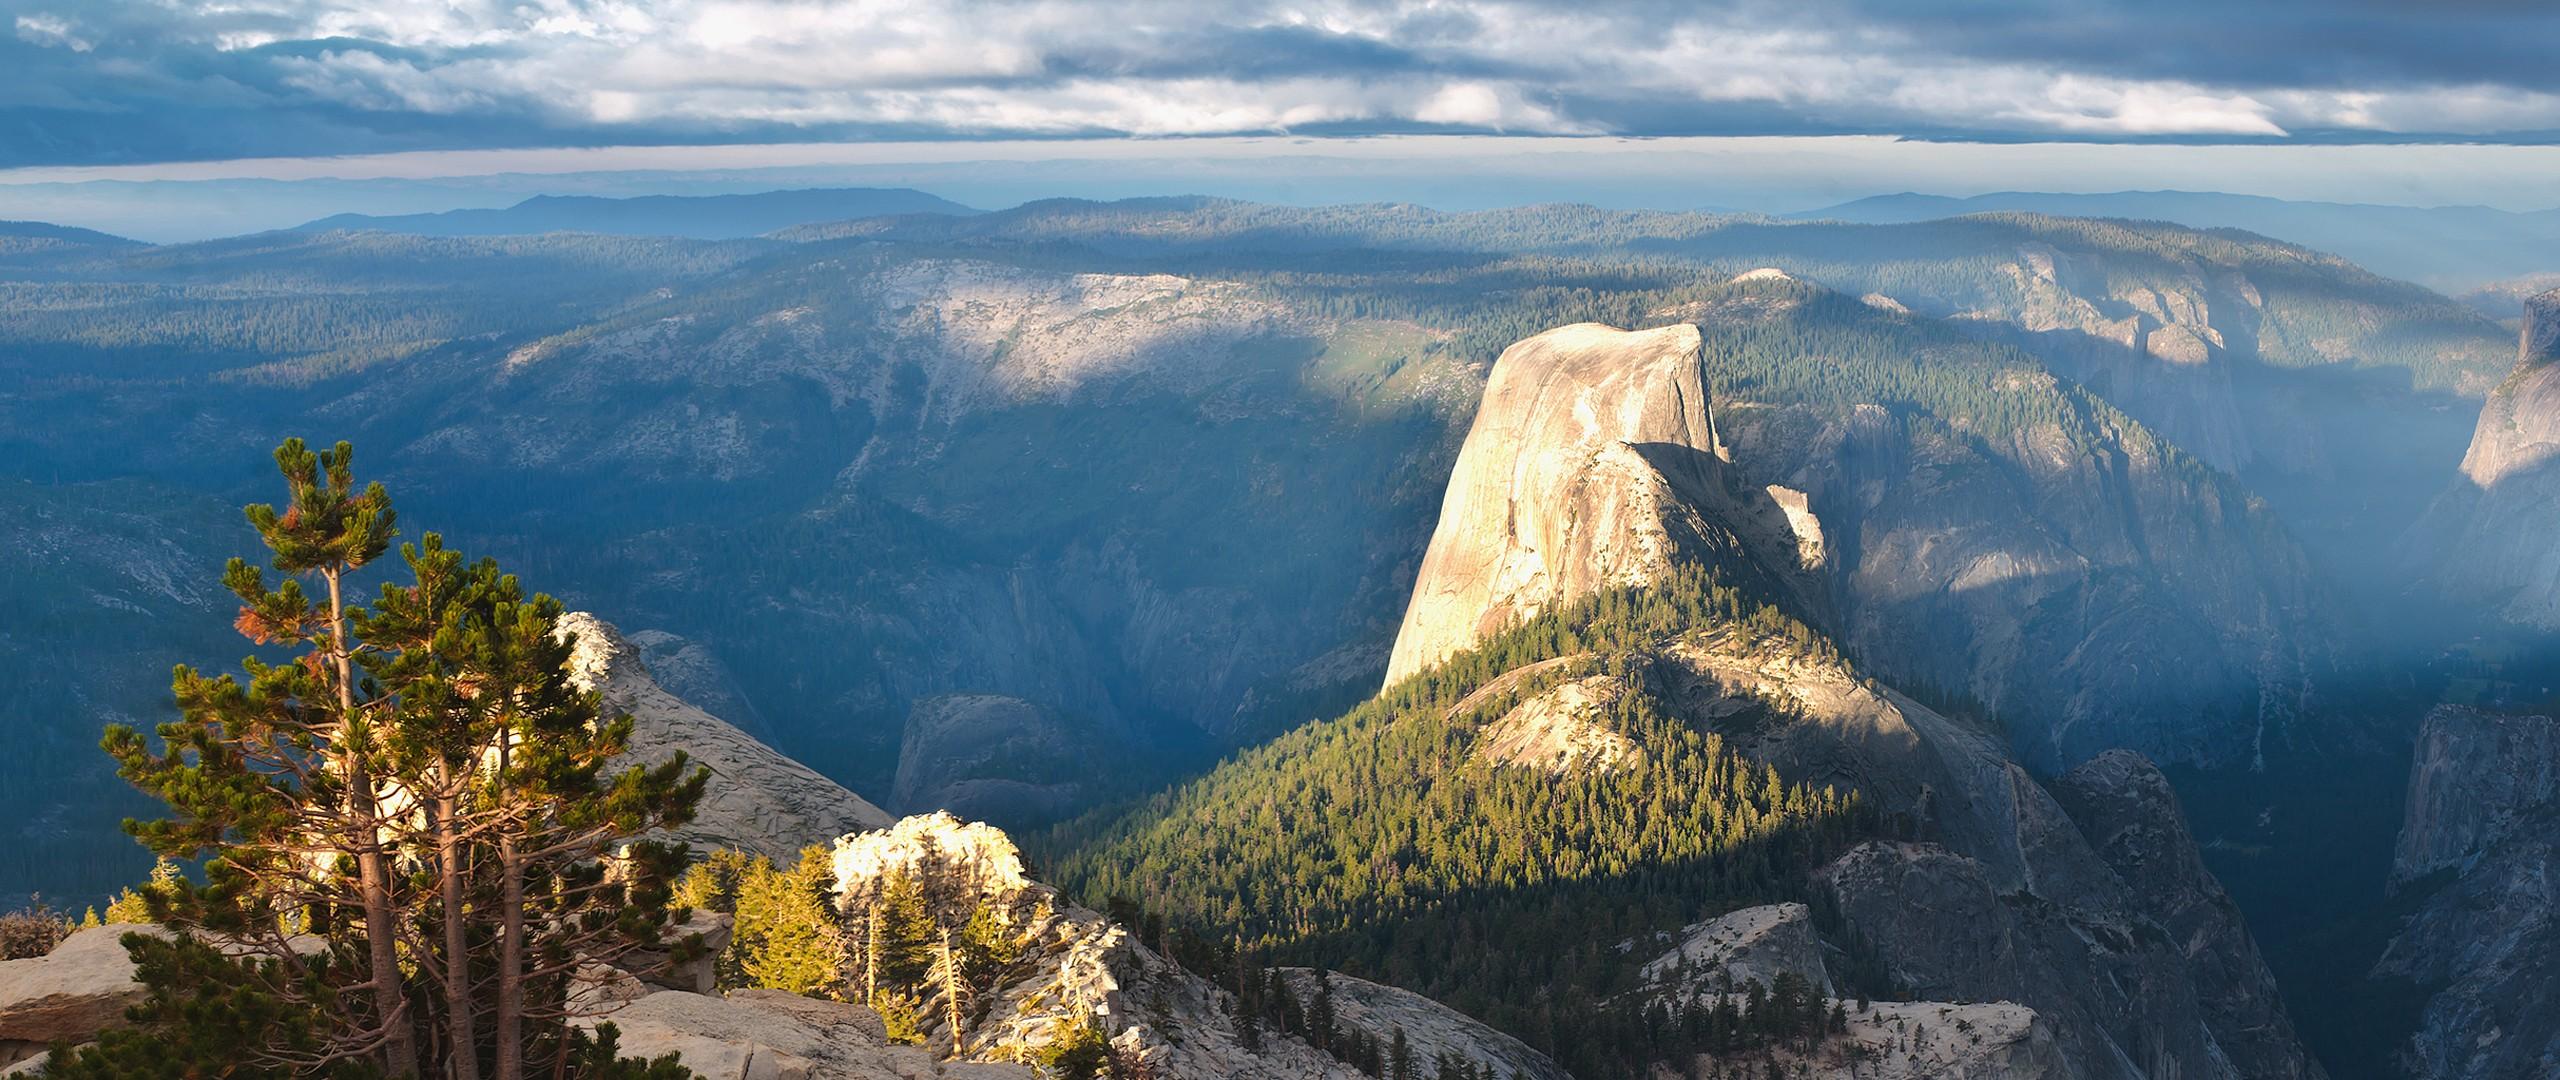 21 landscape wallpapers - photo #44